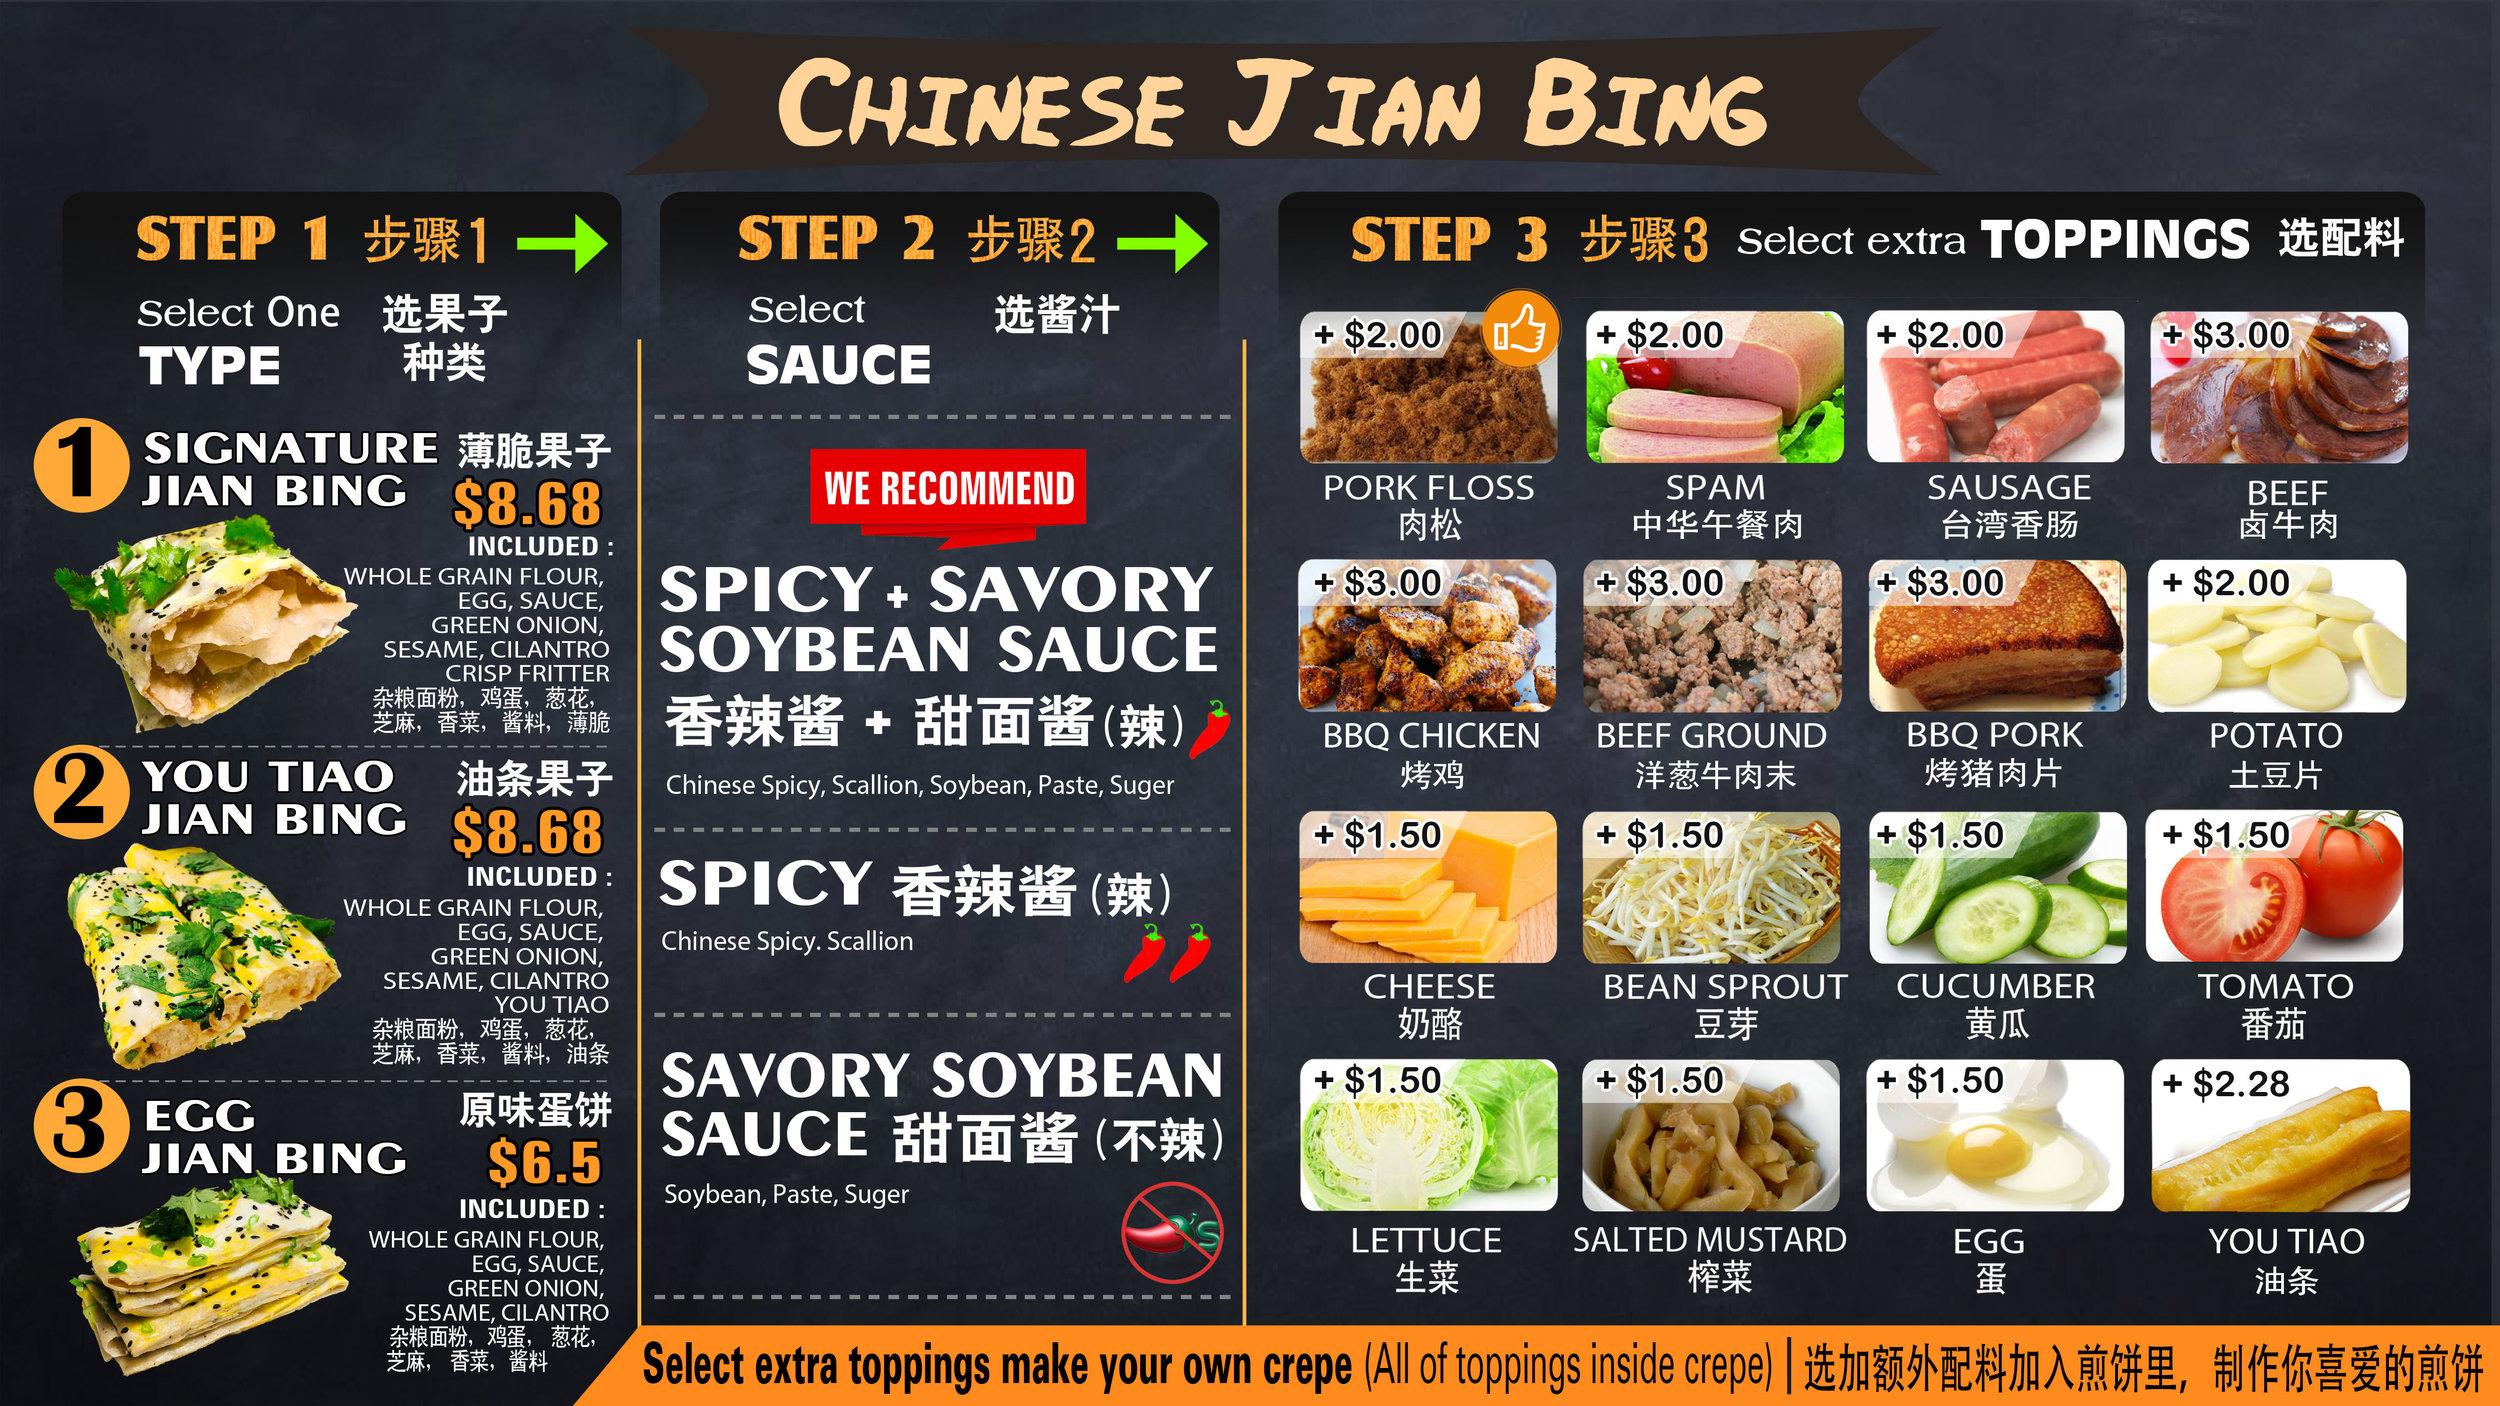 631-633-4066 #5983 TV menu 1 Version 6 2019 march B.jpg